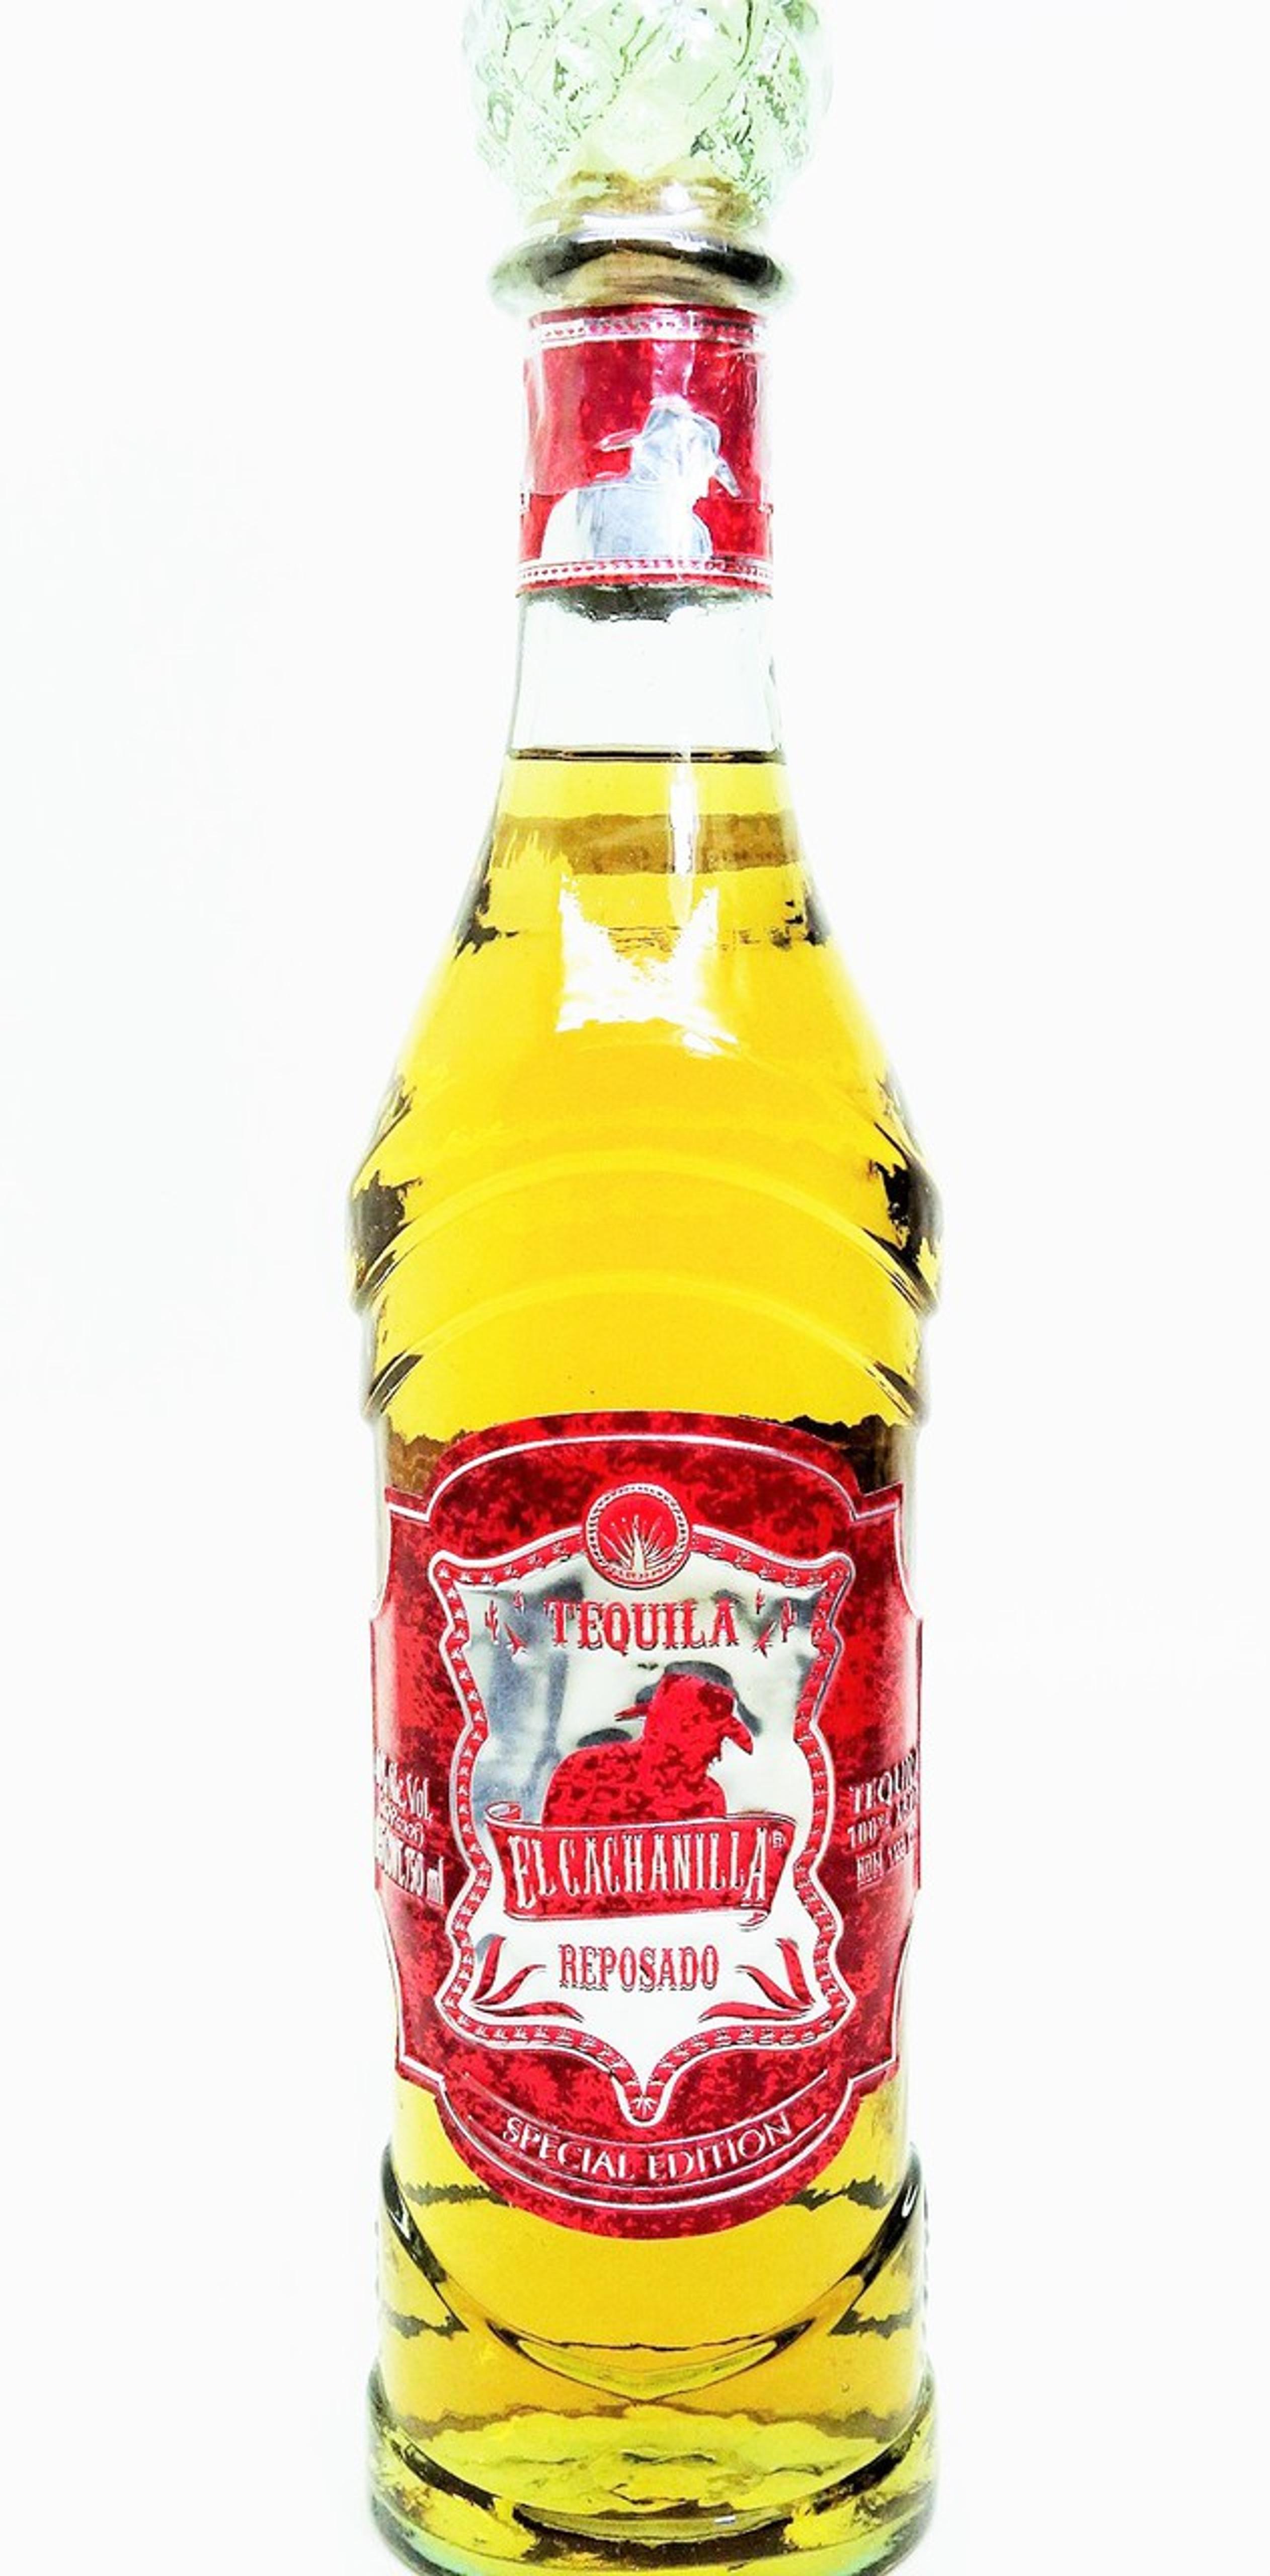 El Capricho Reposado Agave Spirit - Old Town Tequila